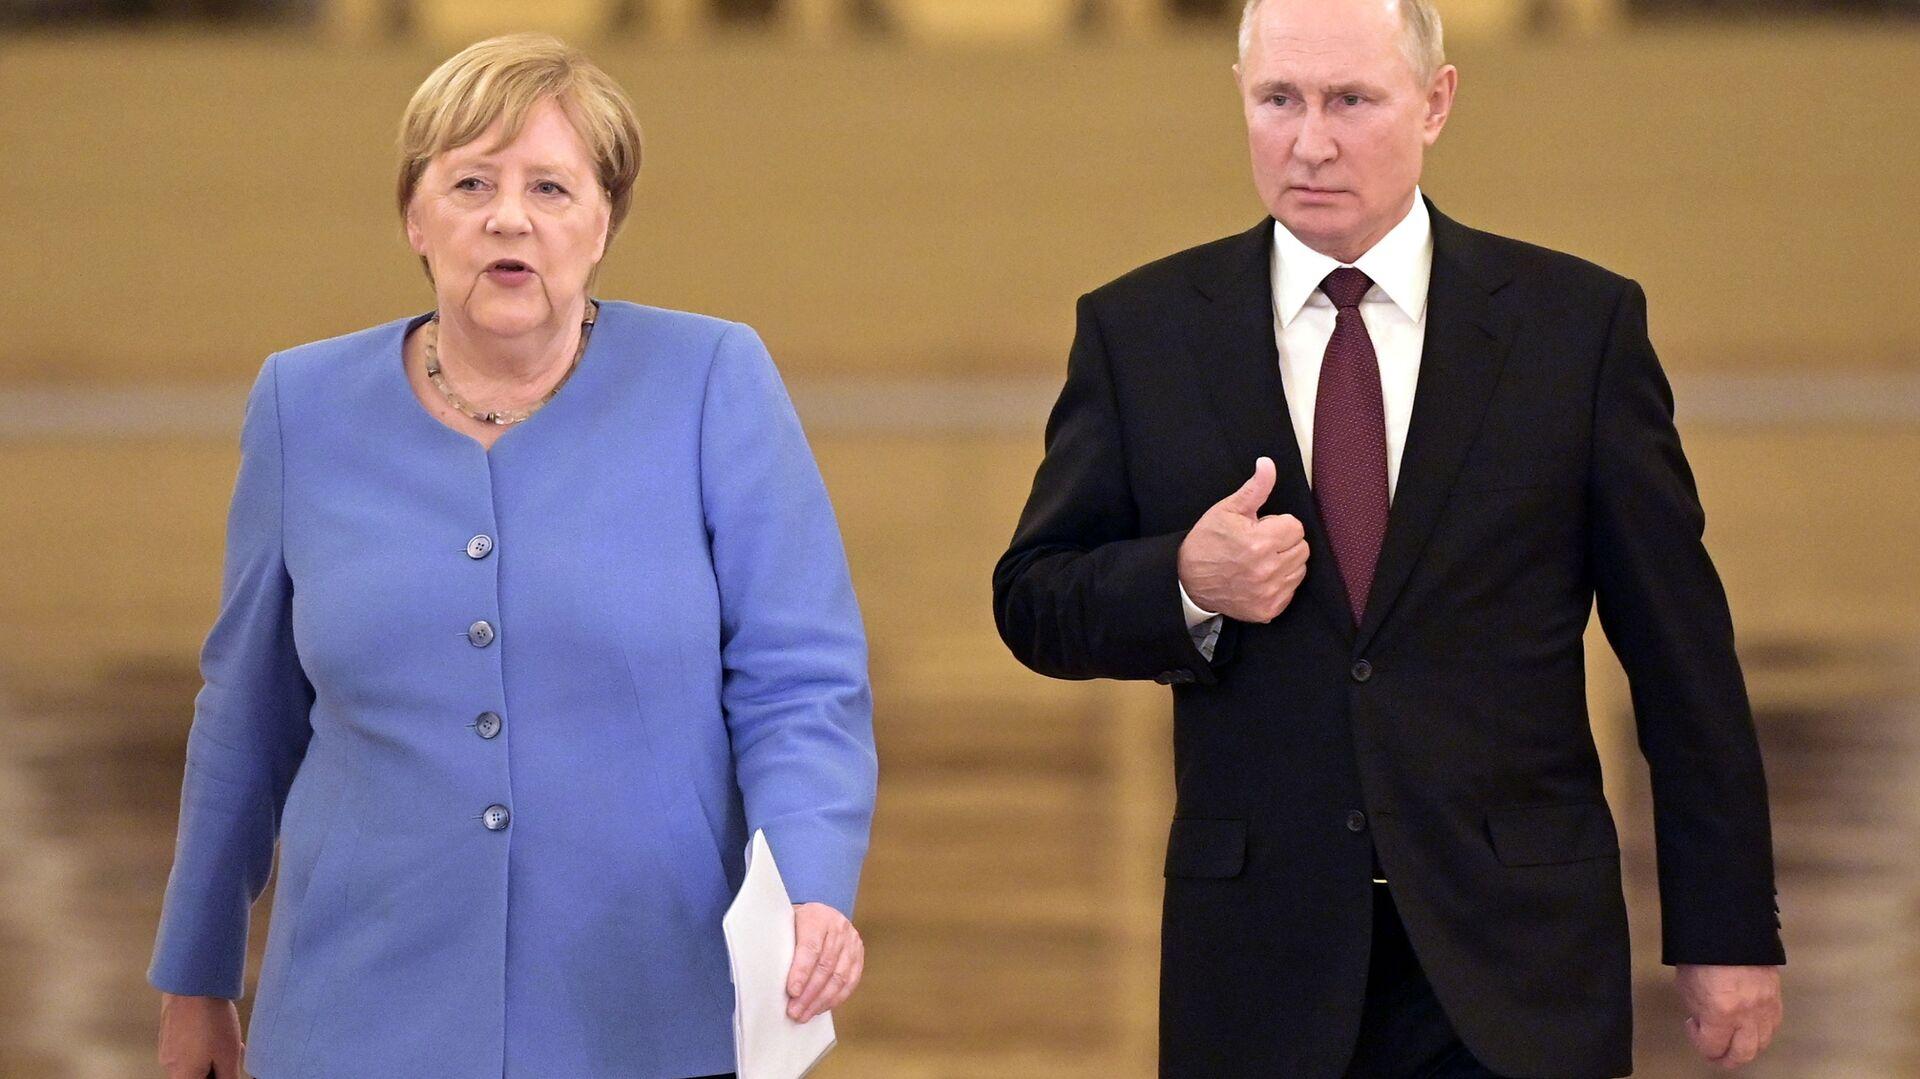 Władimir Putin i Angela Merkel - Sputnik Polska, 1920, 26.09.2021